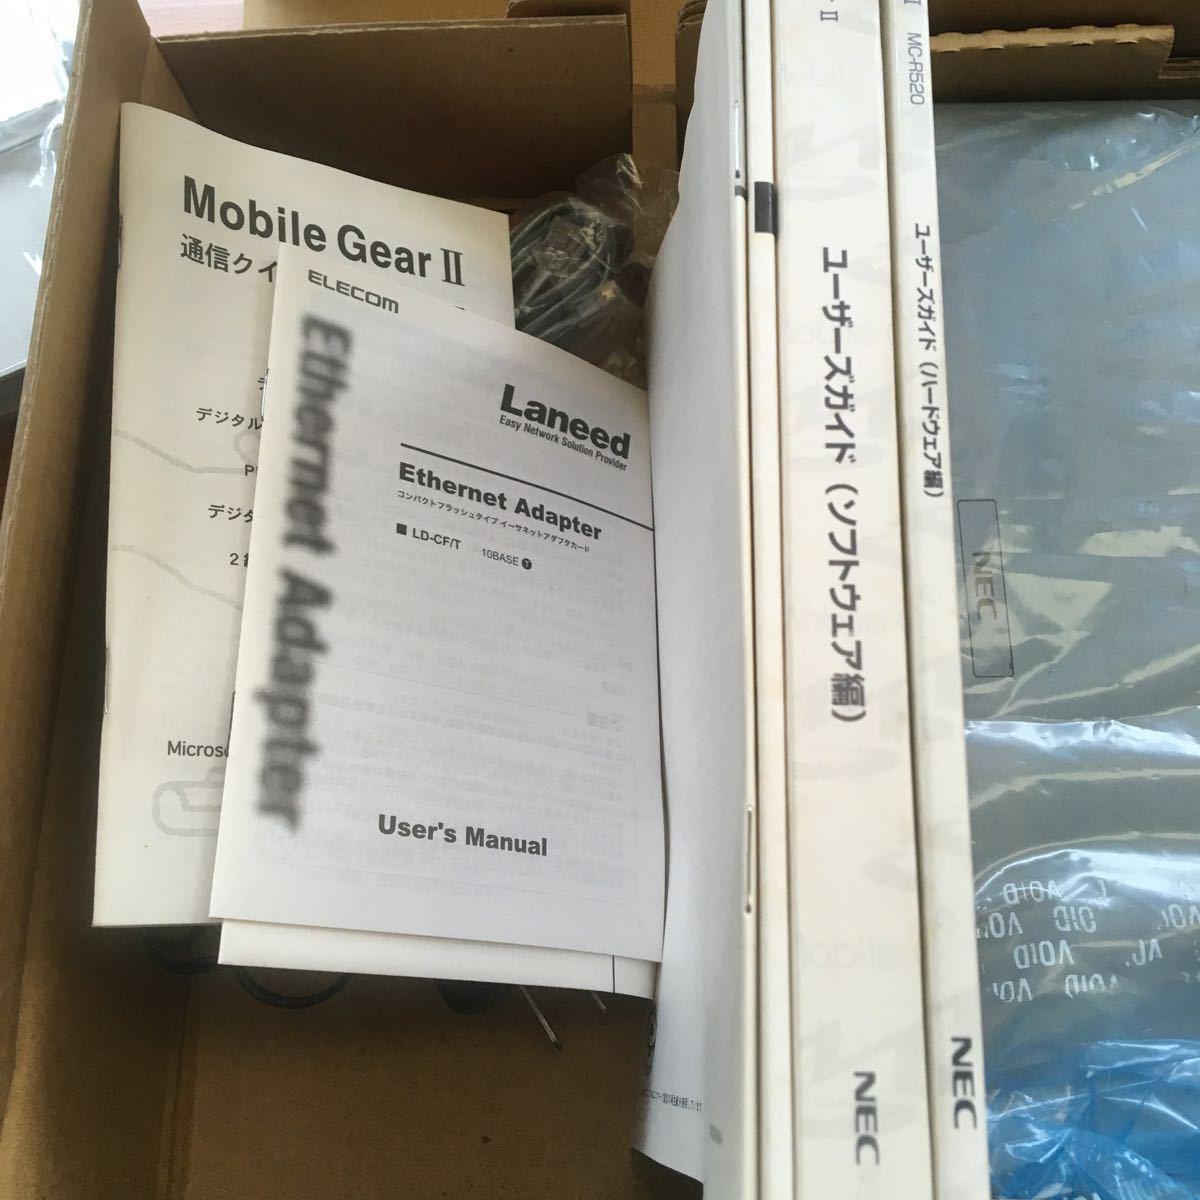 NEC Mobile gear II MC-R520 一式 一部未開封 動作保証なし _画像5